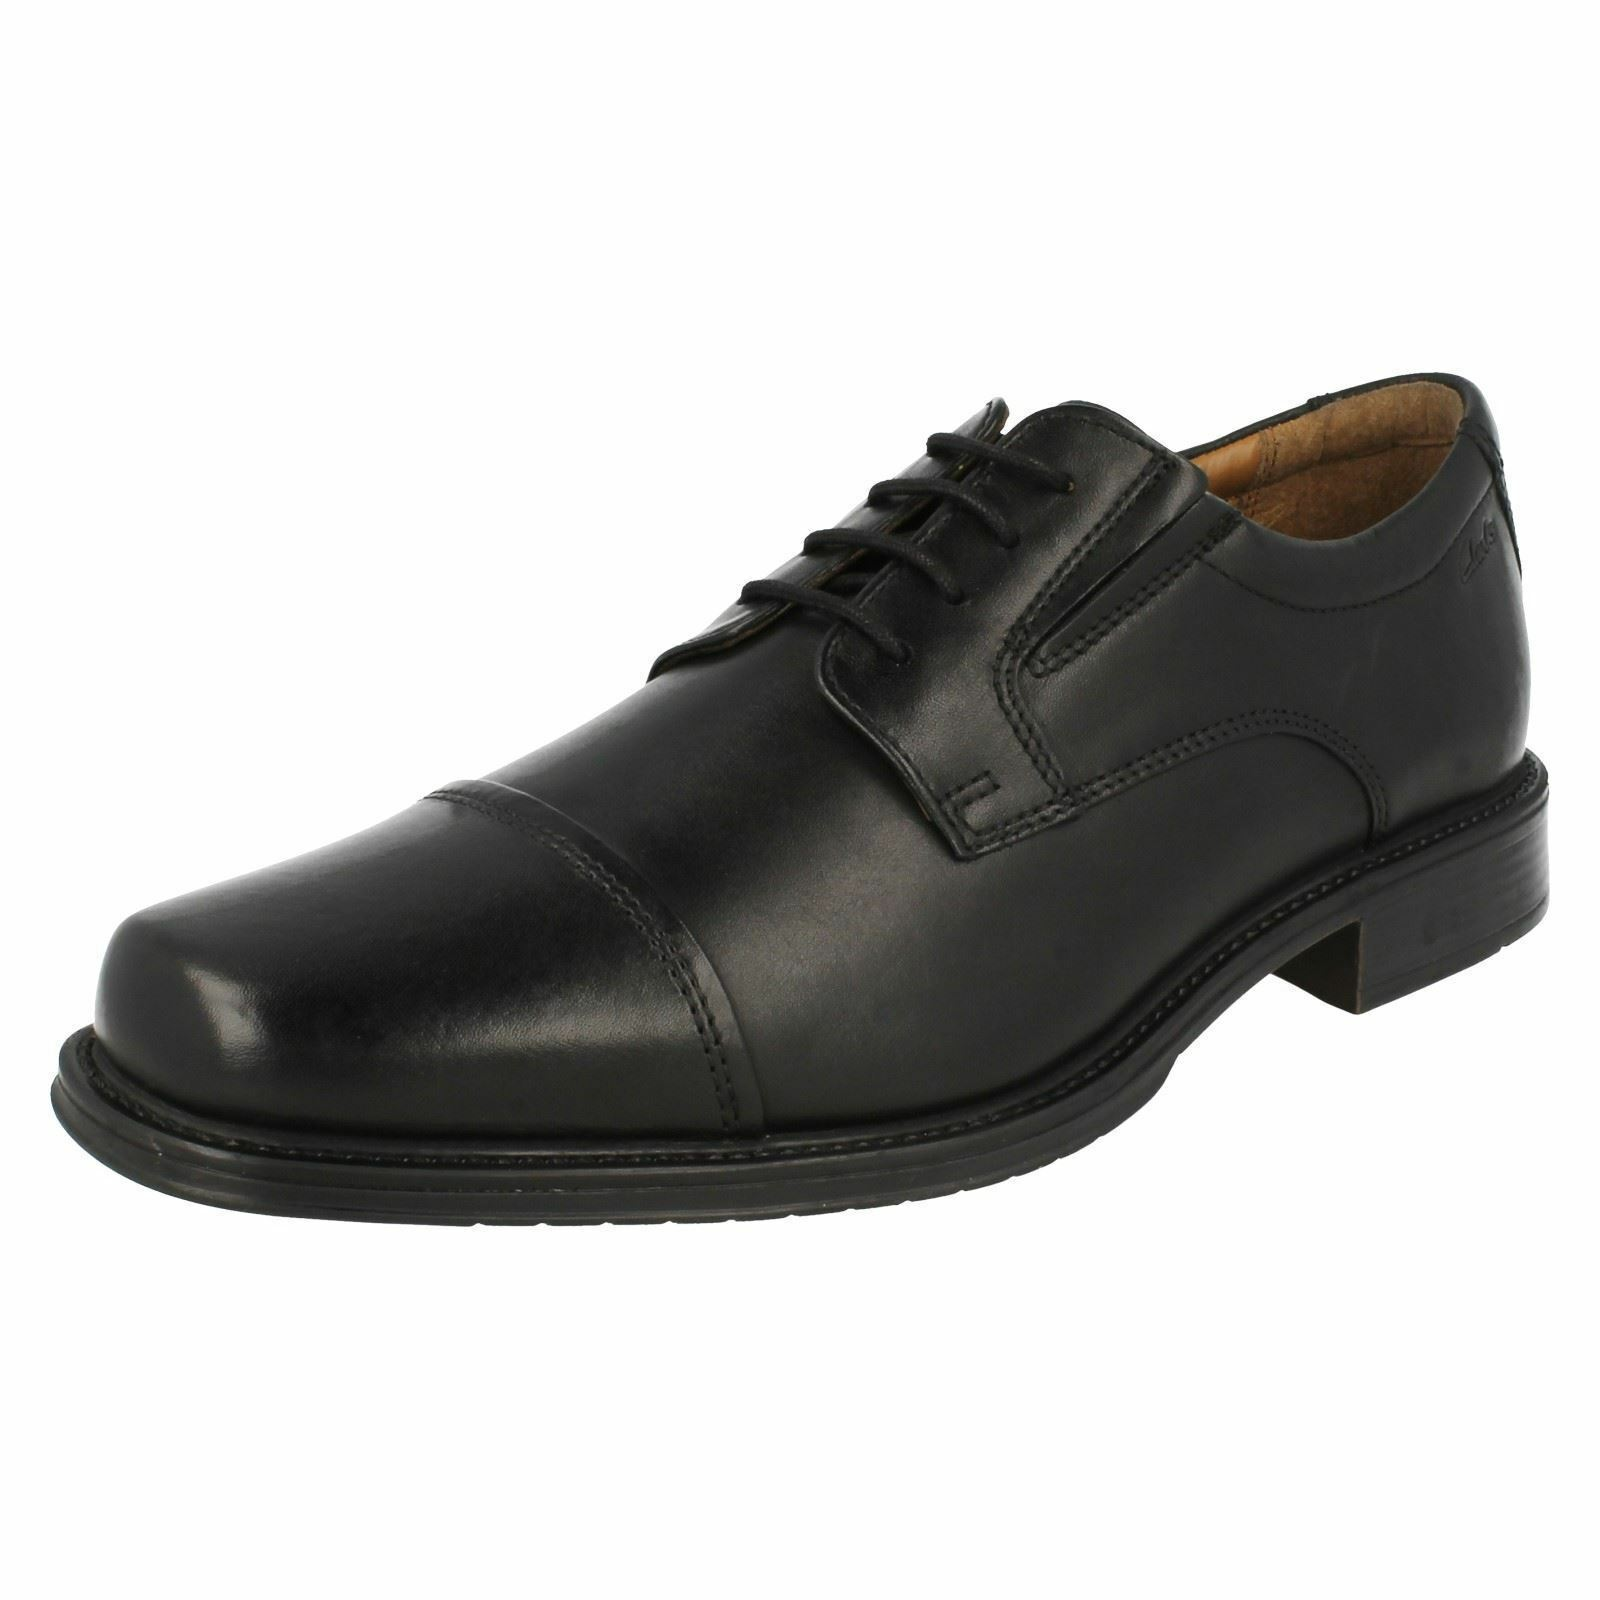 Mens Clarks Driggs Cap Black Leather Smart Lace Up Shoes